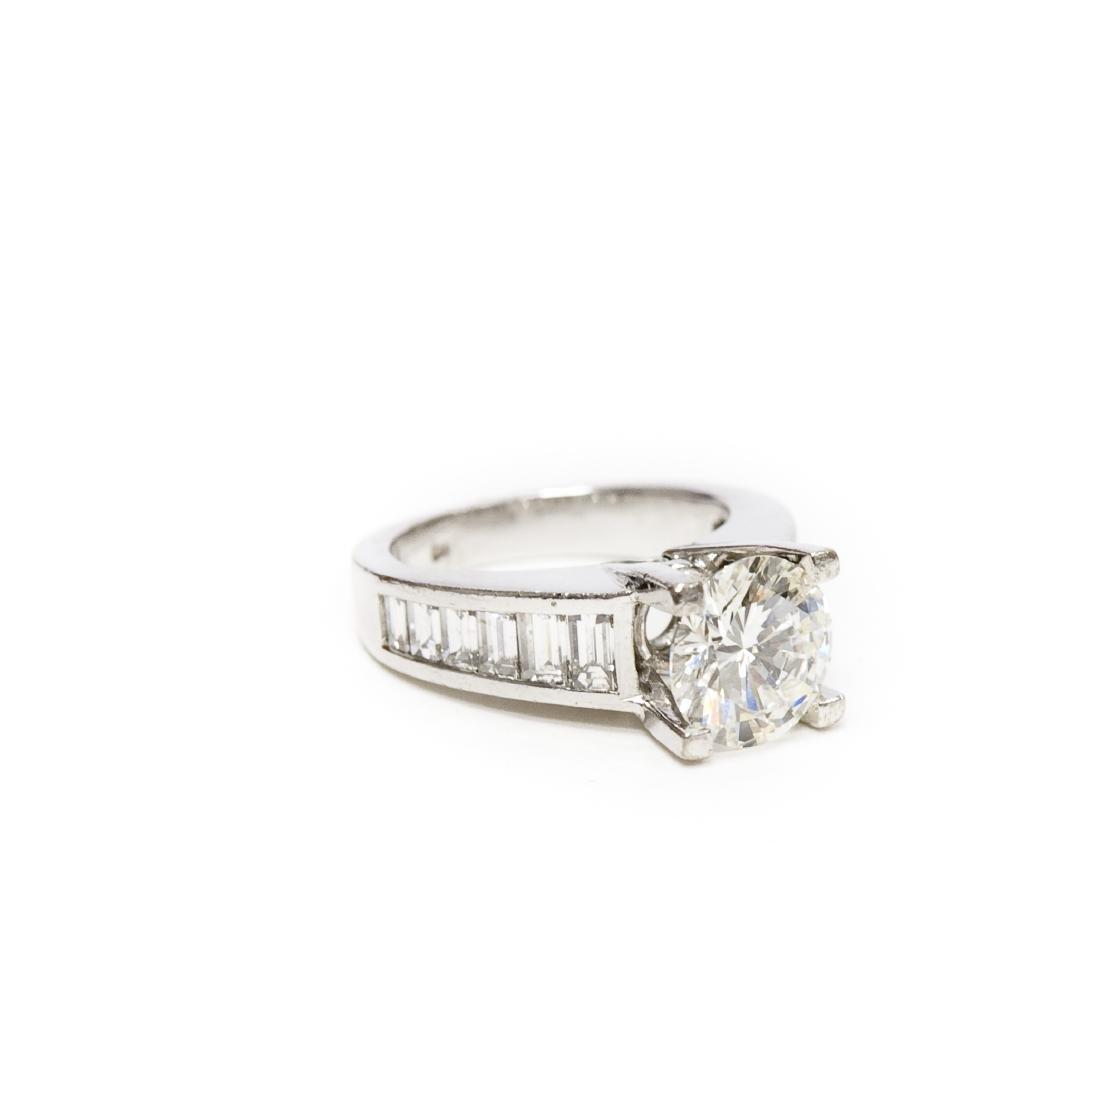 18K White Gold & Diamond Ring. 2.17 ct Center Diamond. - 3